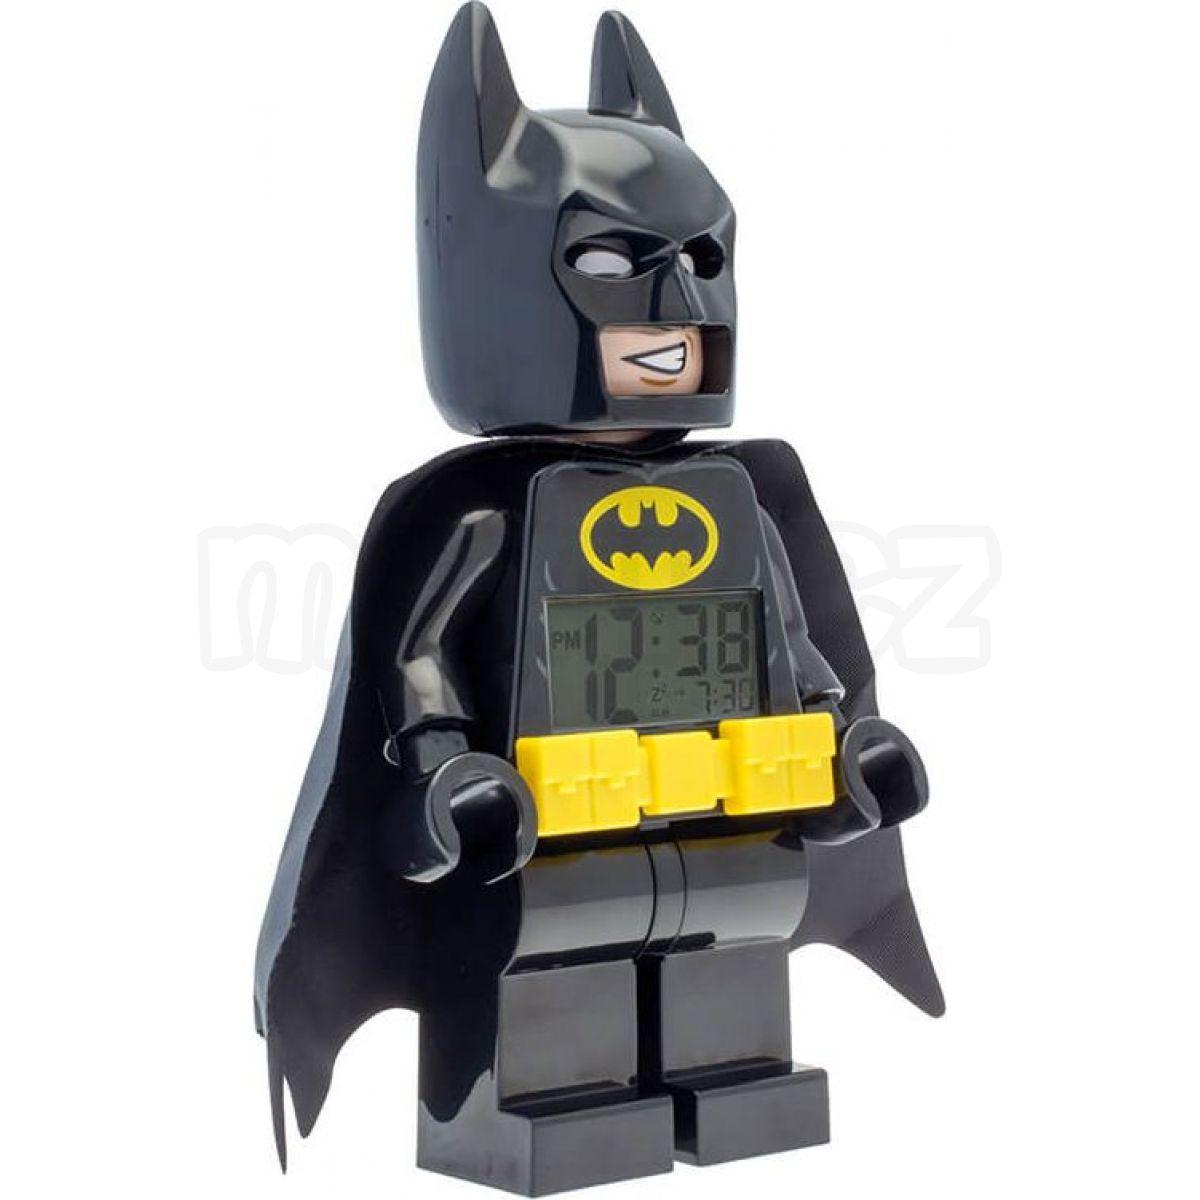 Lego batman movie batman hodiny s bud kem max kovy hra ky for Videos de lego batman